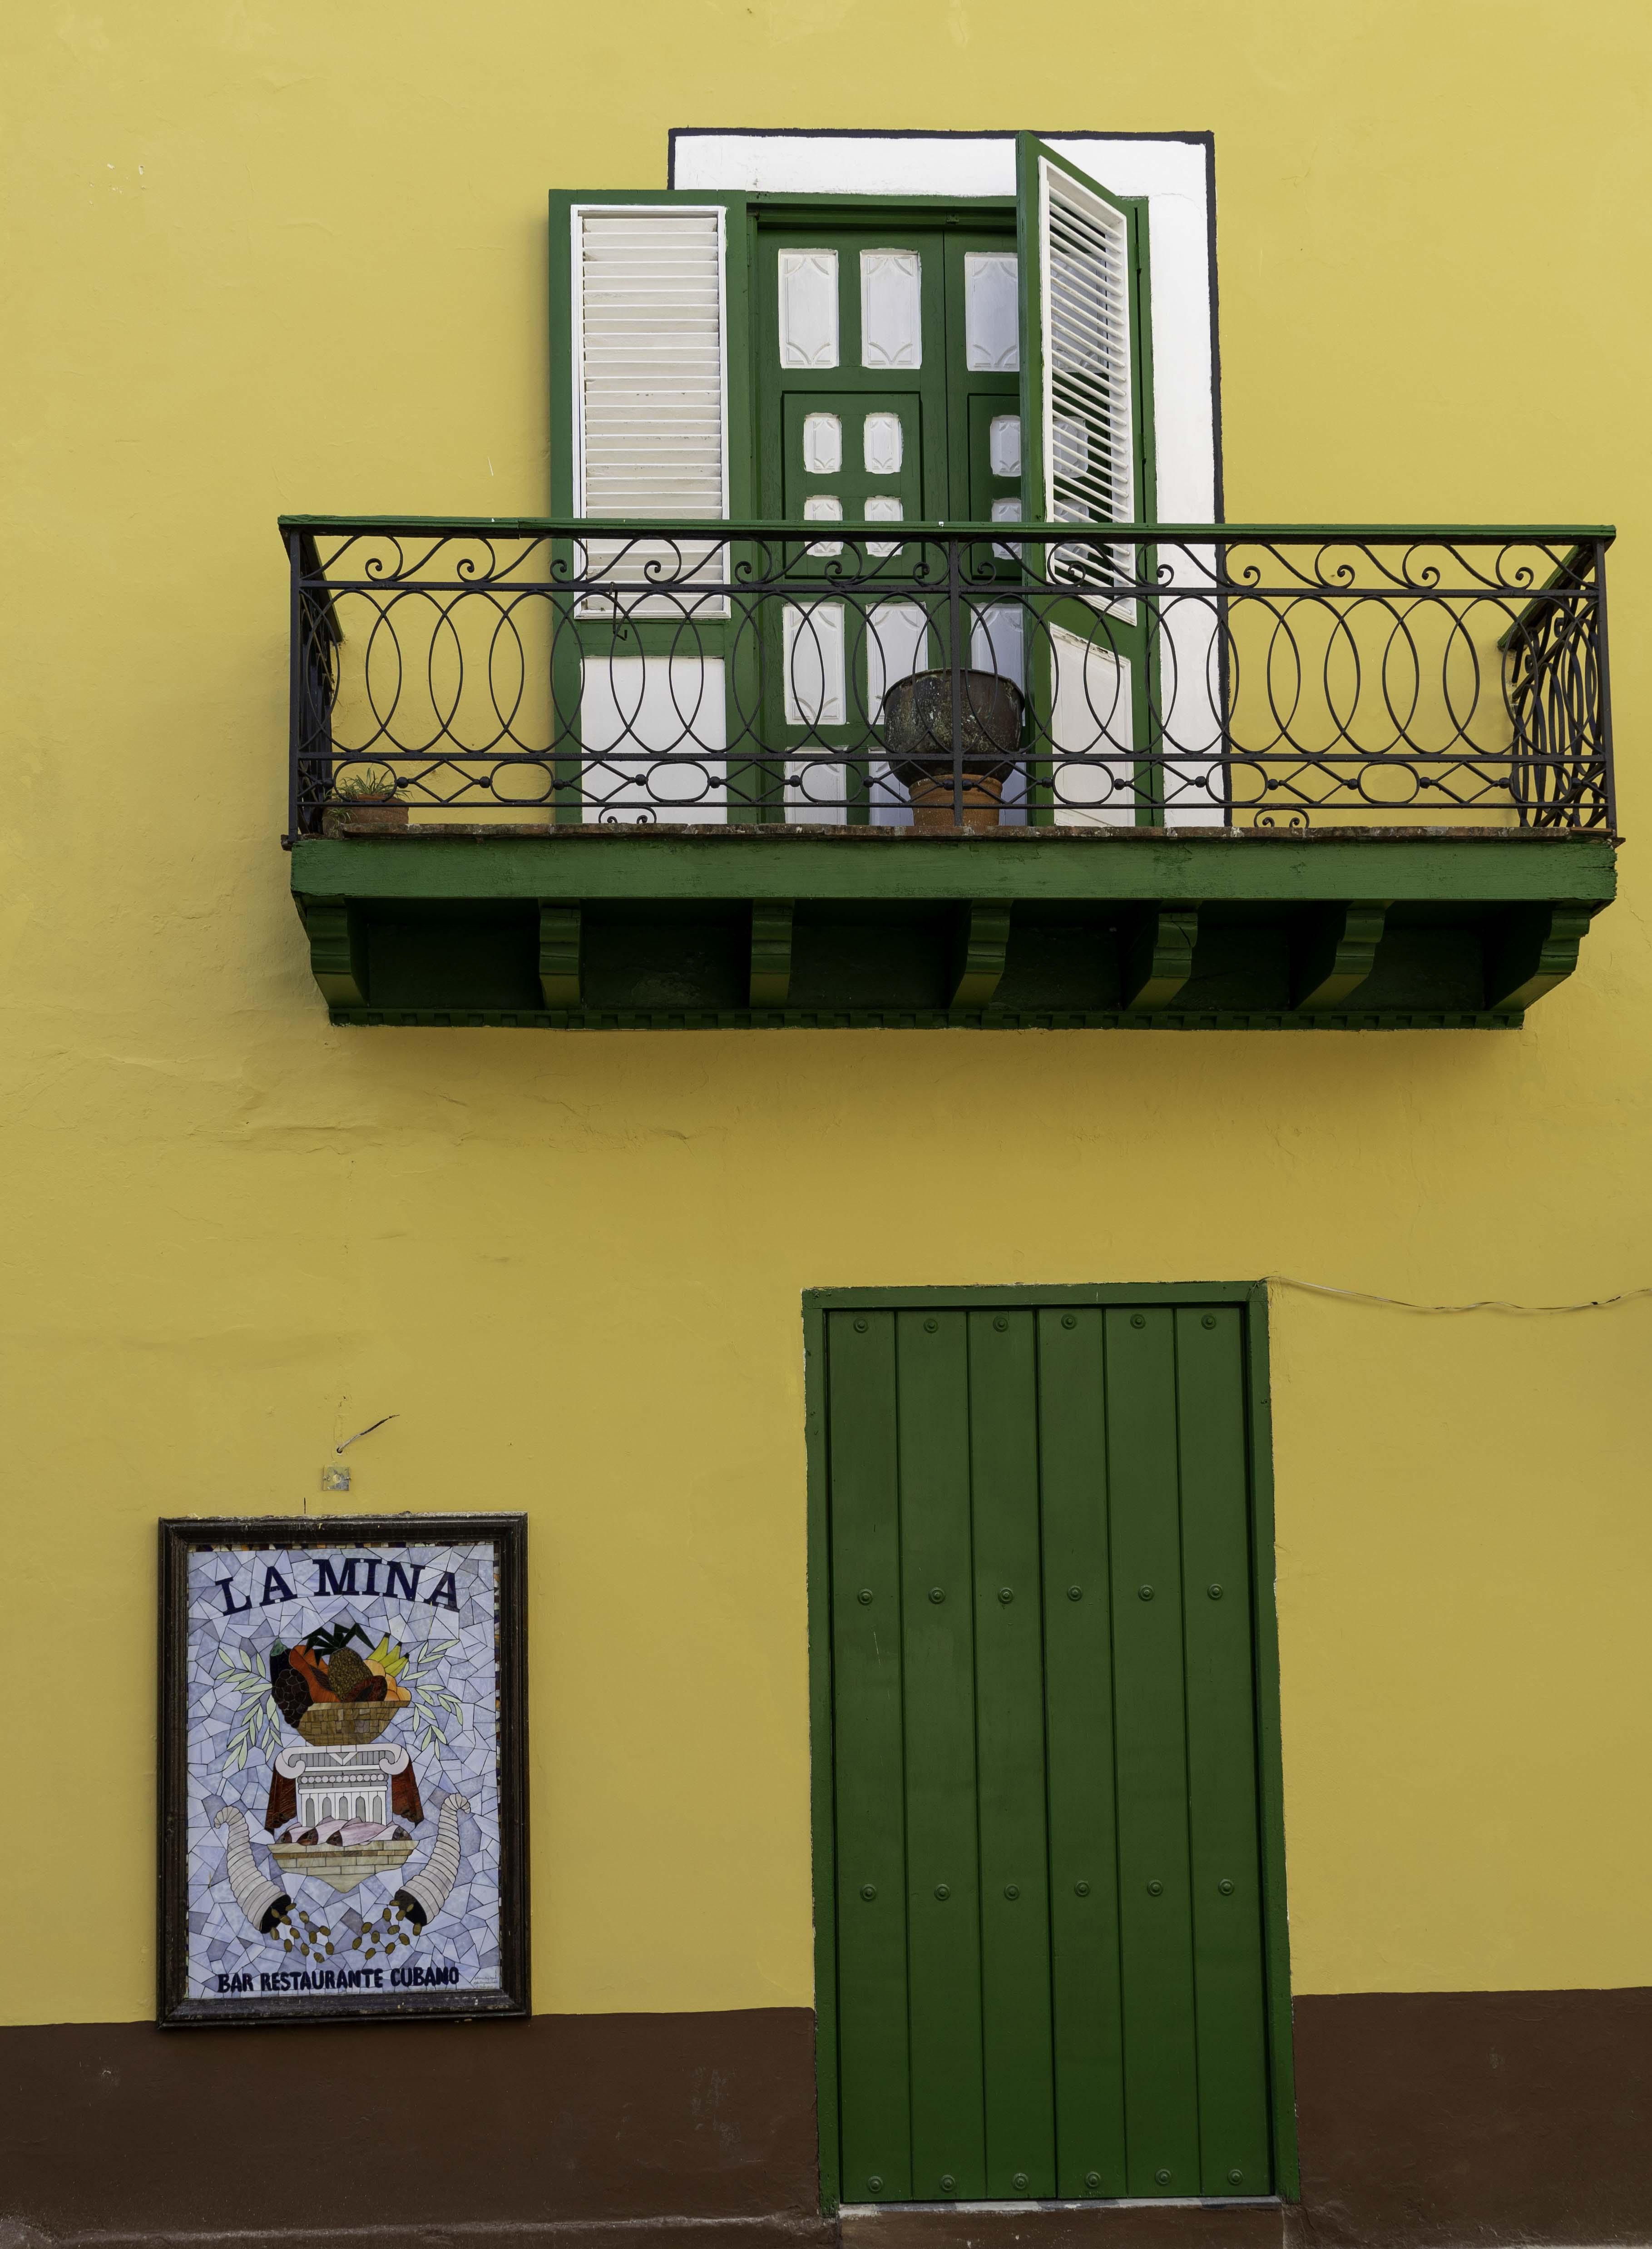 sights of havana vieja, cuba 4 - derek chambers